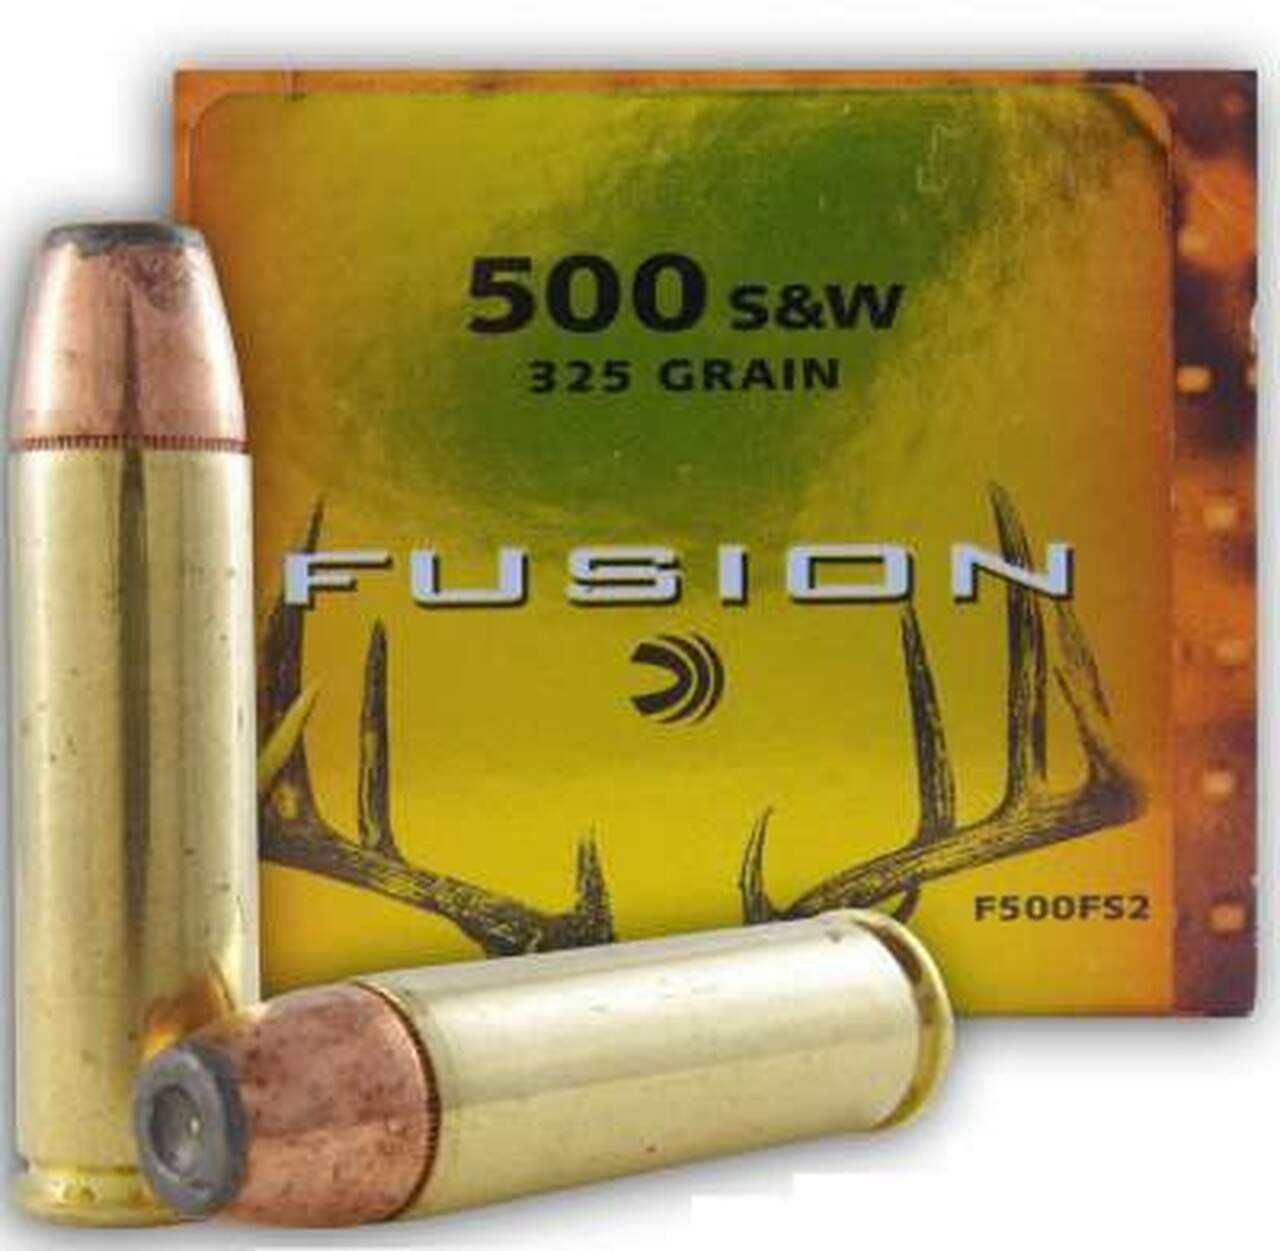 500 S&W Mag Ammo